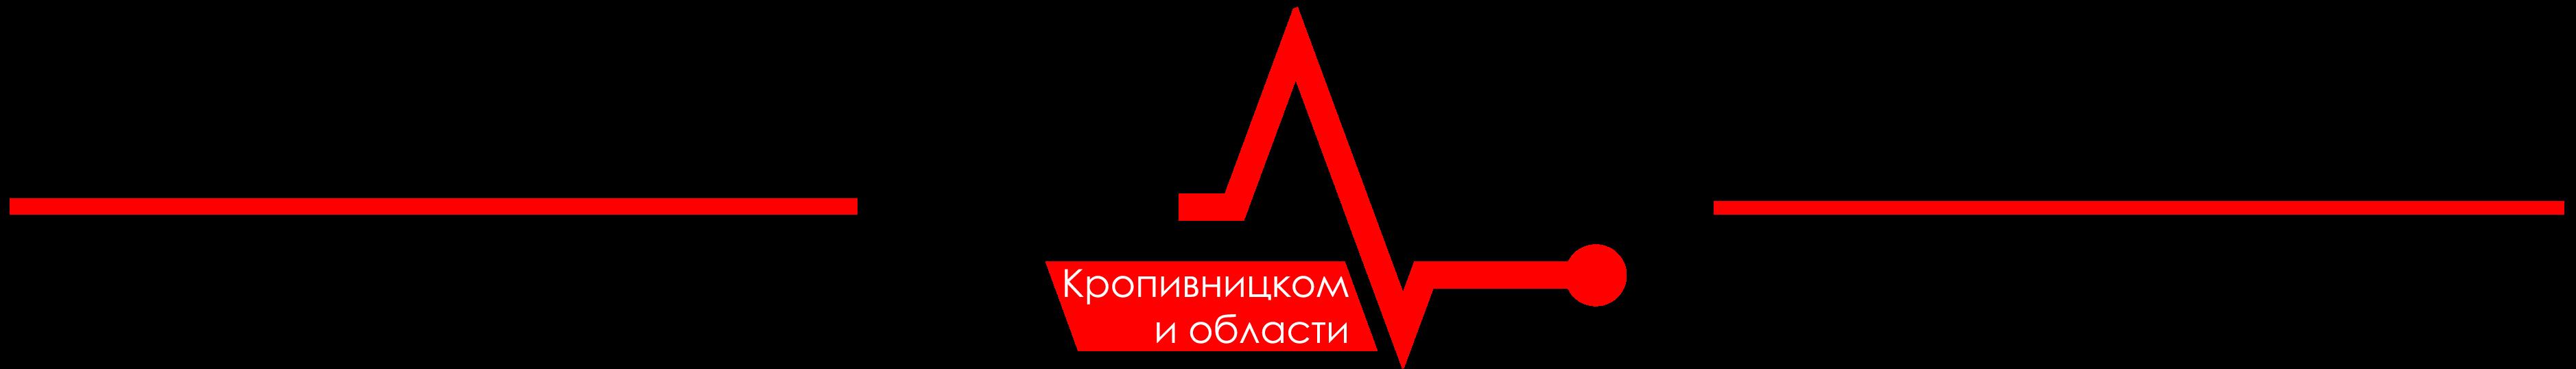 пульS – Все о Кропивницком и области